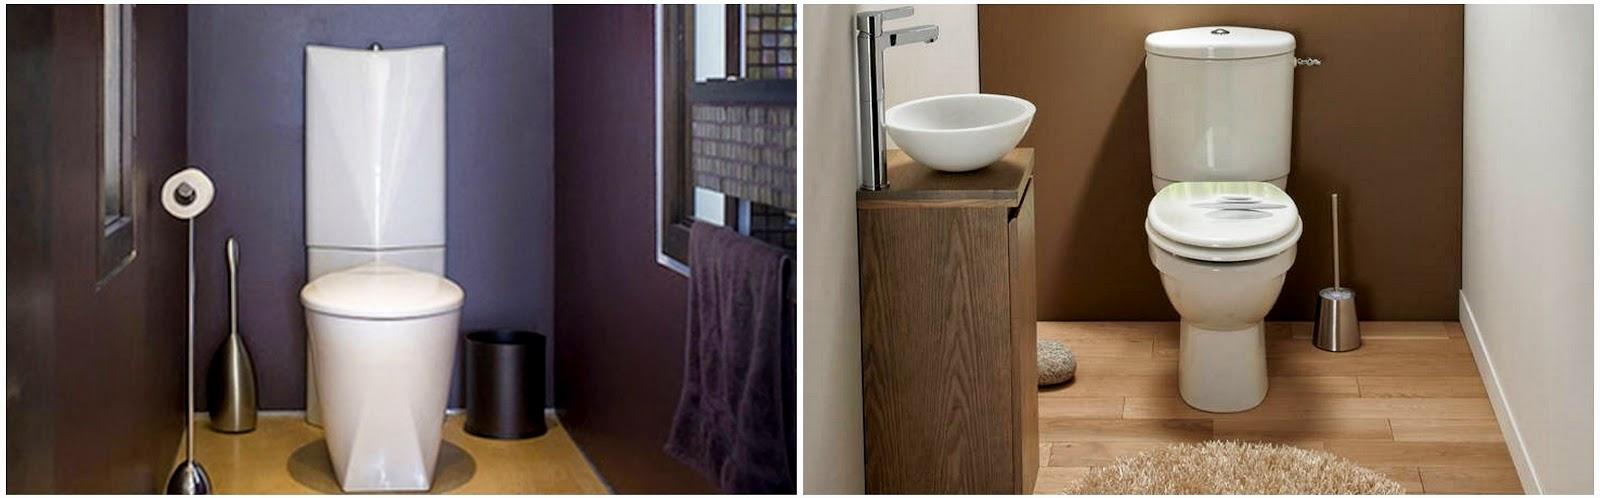 renovation travaux peinture toilettes wc paris renov ex. Black Bedroom Furniture Sets. Home Design Ideas